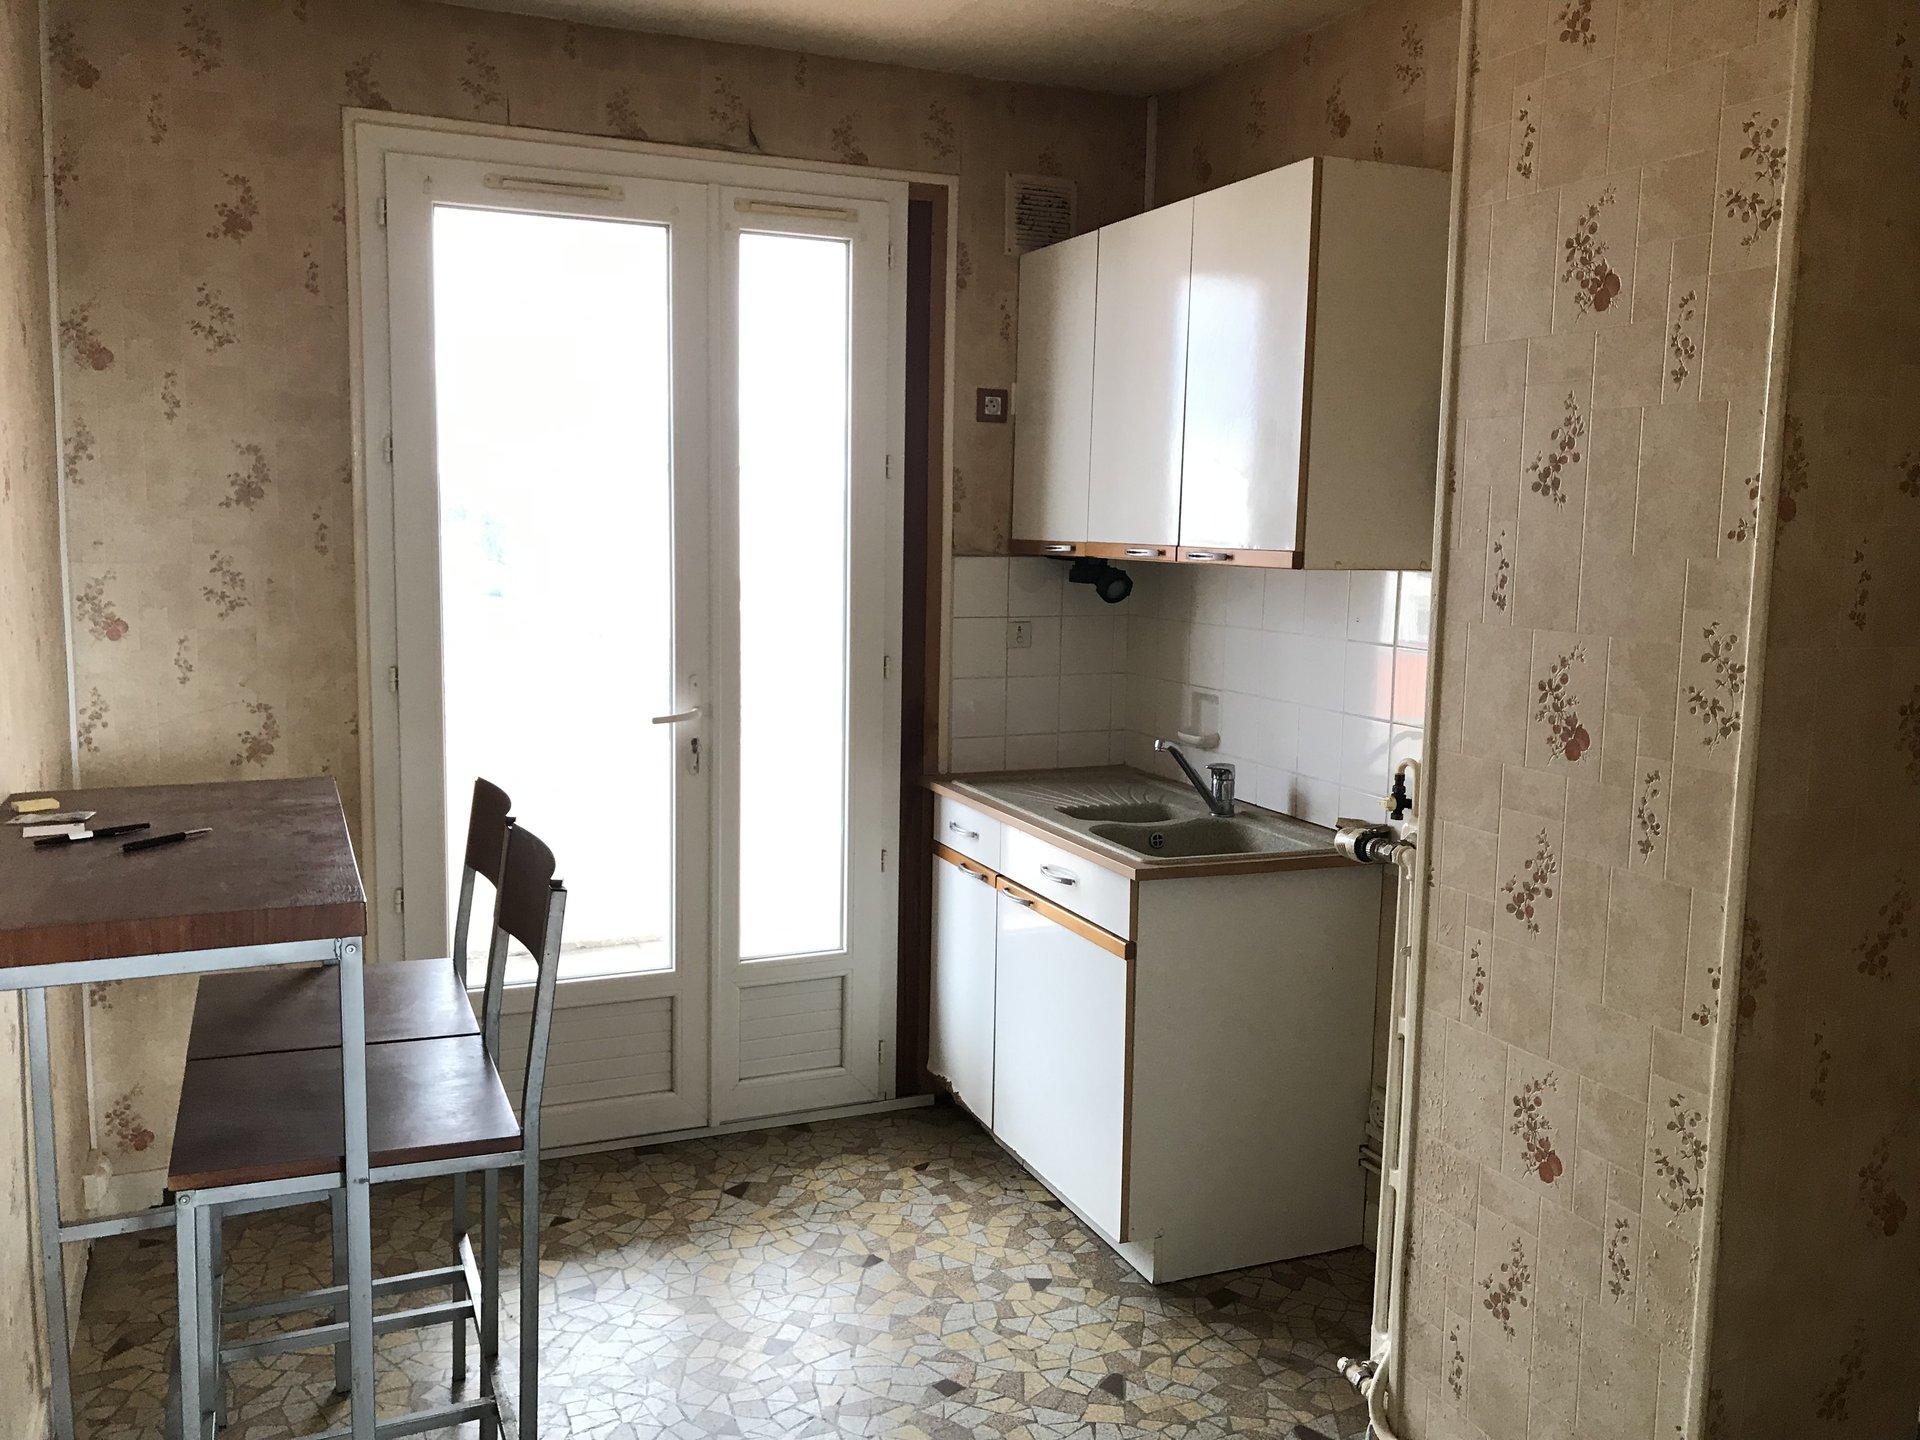 5627AJA - Appartement T3 - Balcon - VICHY J'Arc